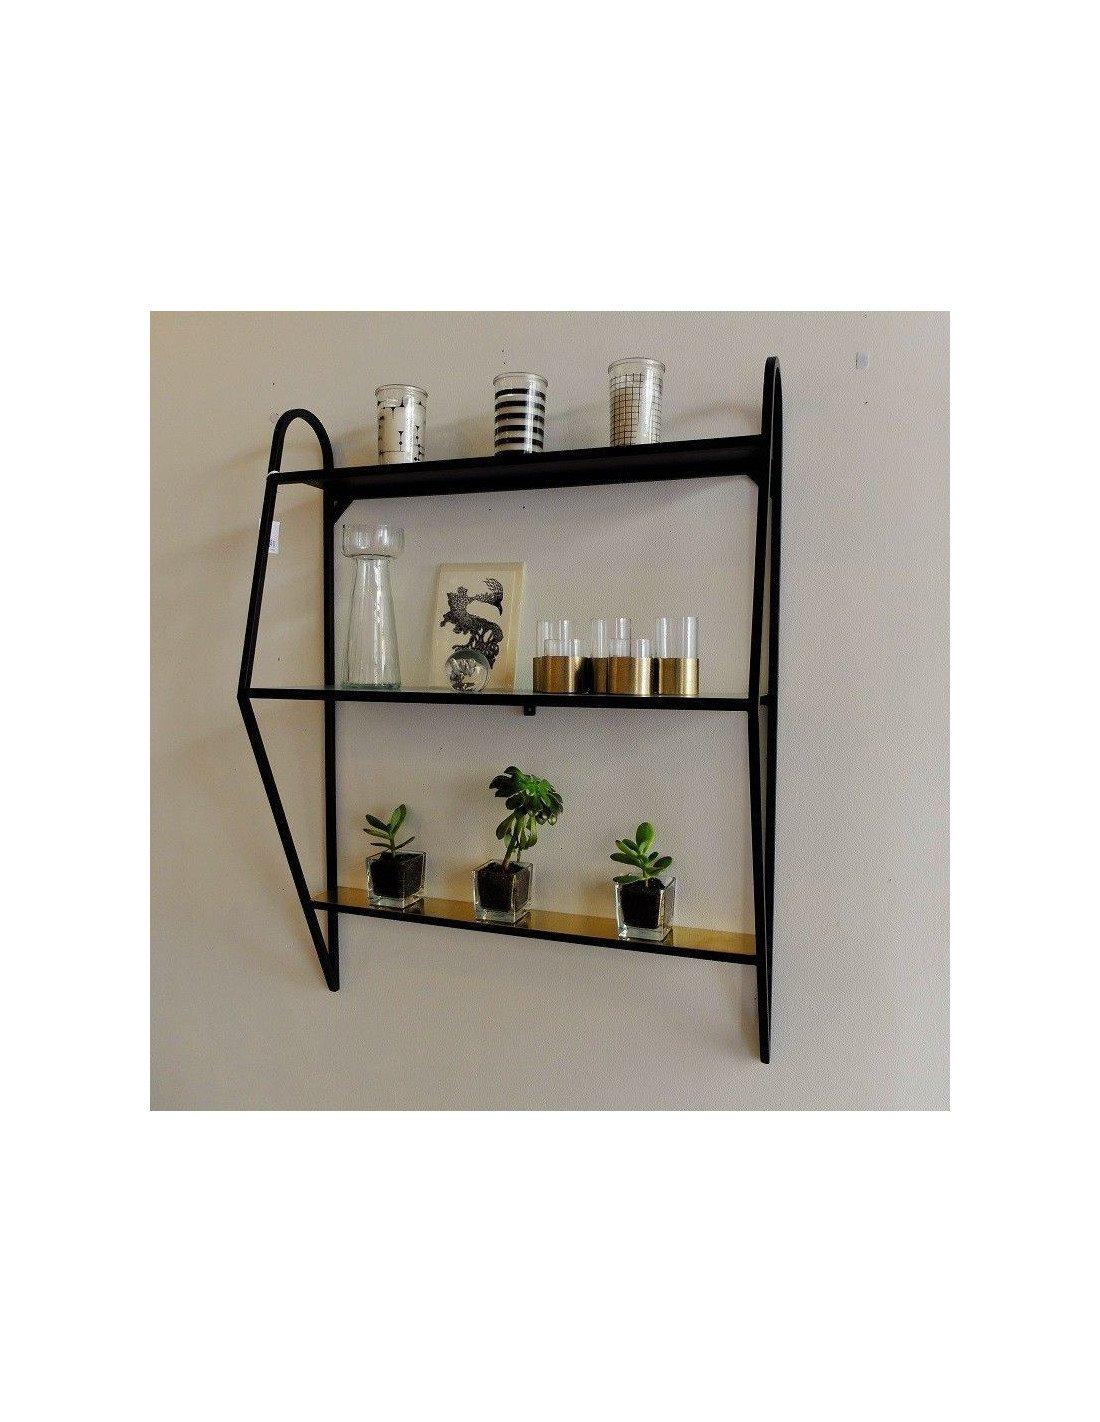 serax etag re au design sixties bois et m tal design pj mares. Black Bedroom Furniture Sets. Home Design Ideas